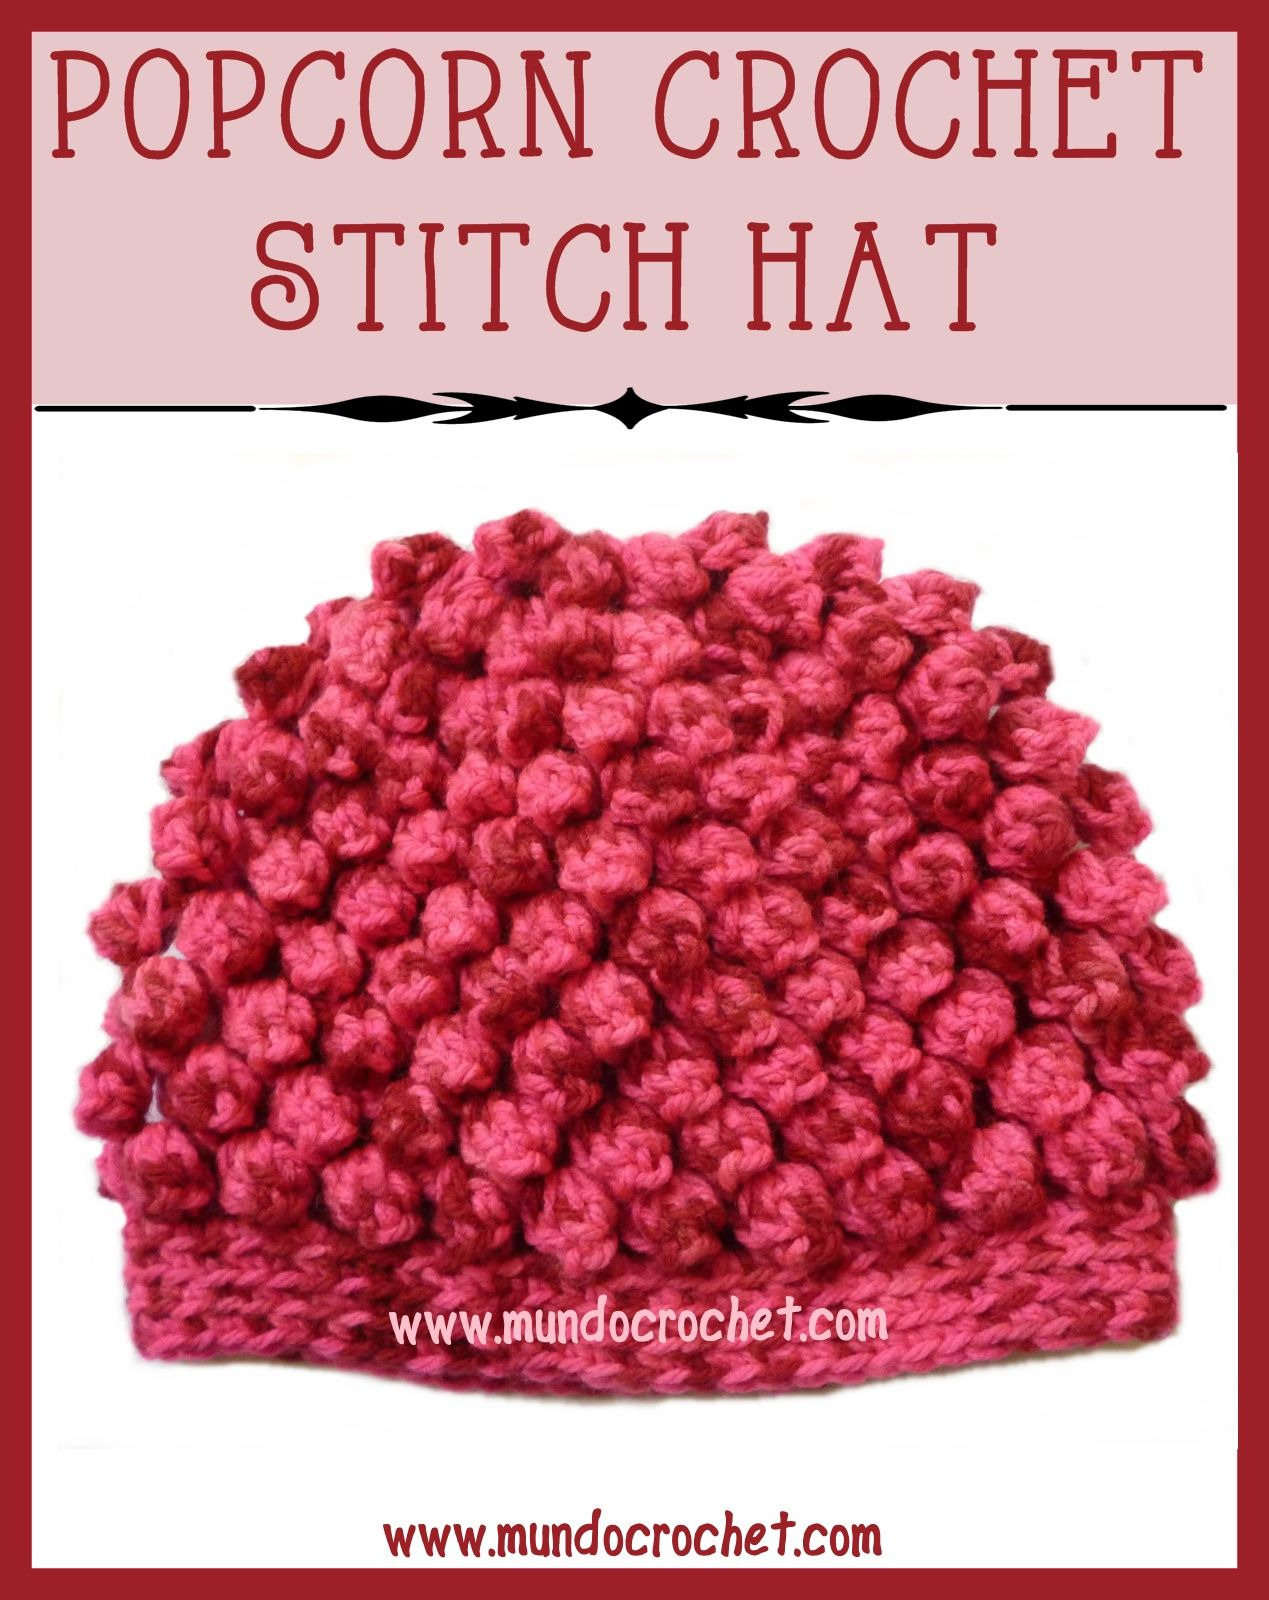 Pin de Traci Wright en Crochet For Your Dome | Pinterest